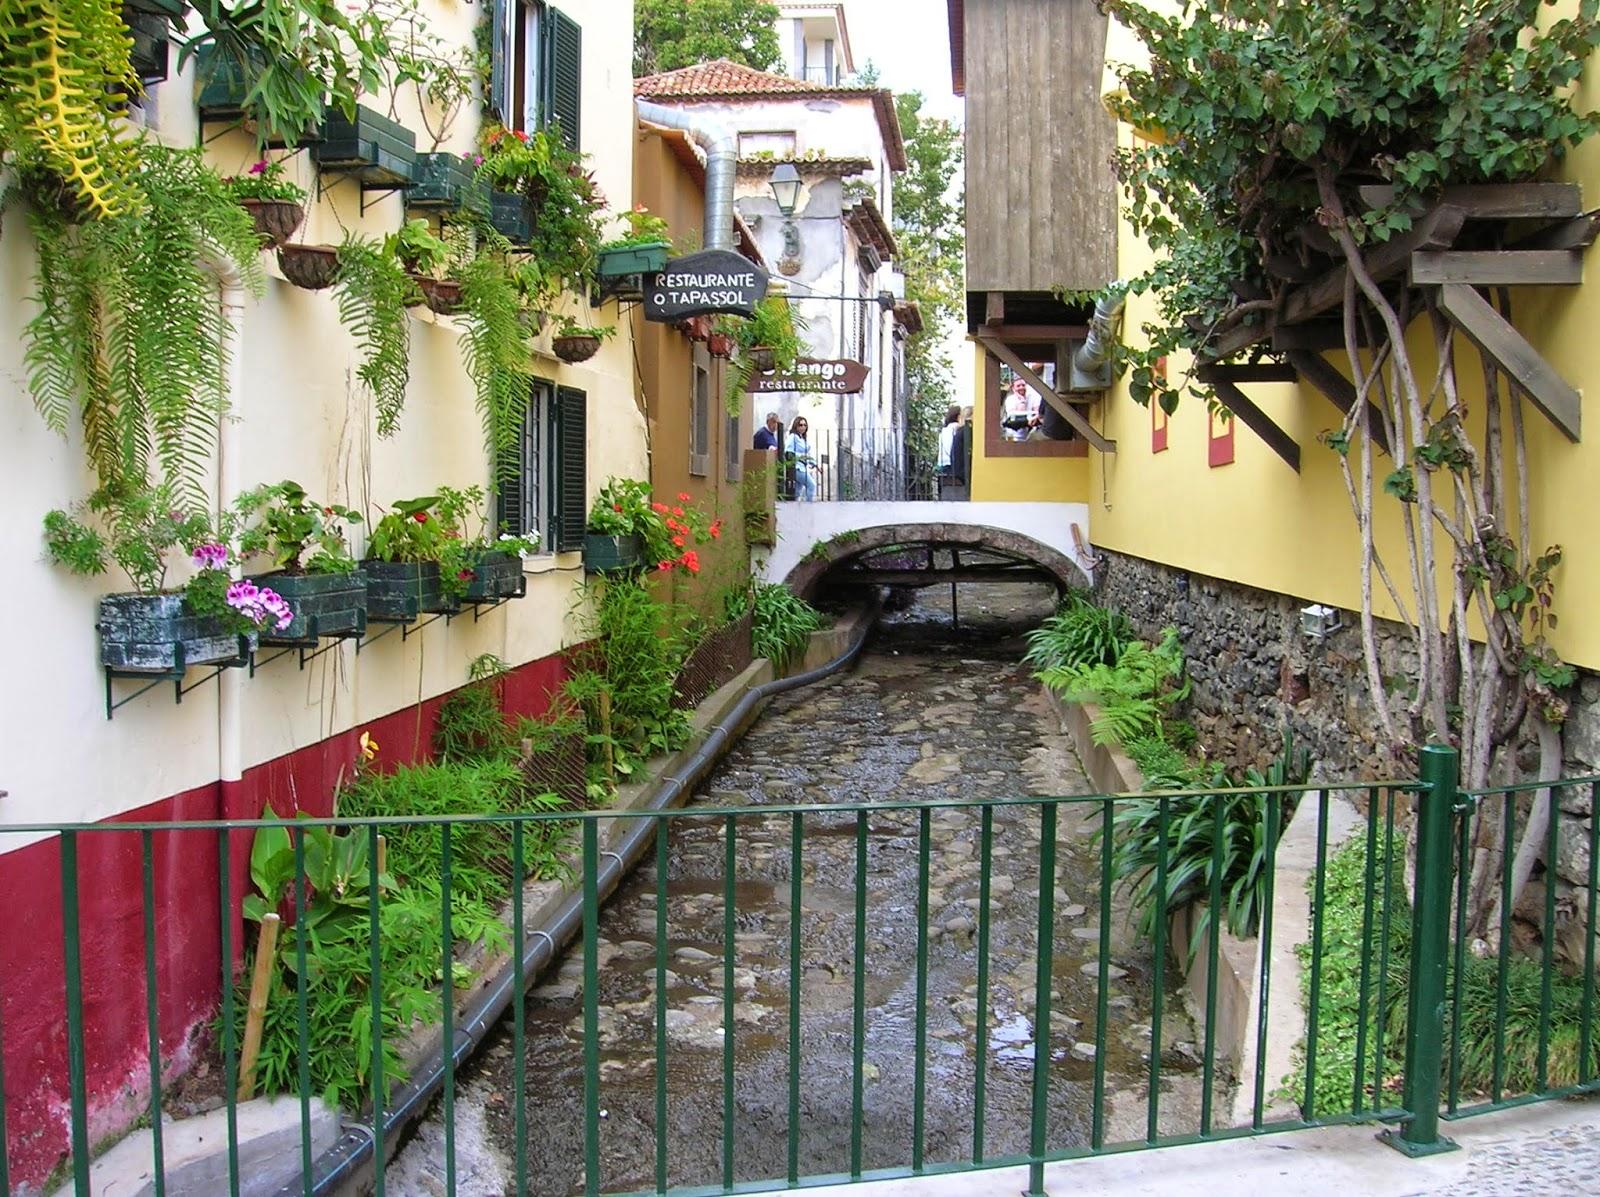 Casco Antiguo, Zona Velha, Funchal, Madeira, Portugal, La vuelta al mundo de Asun y Ricardo, round the world, mundoporlibre.com